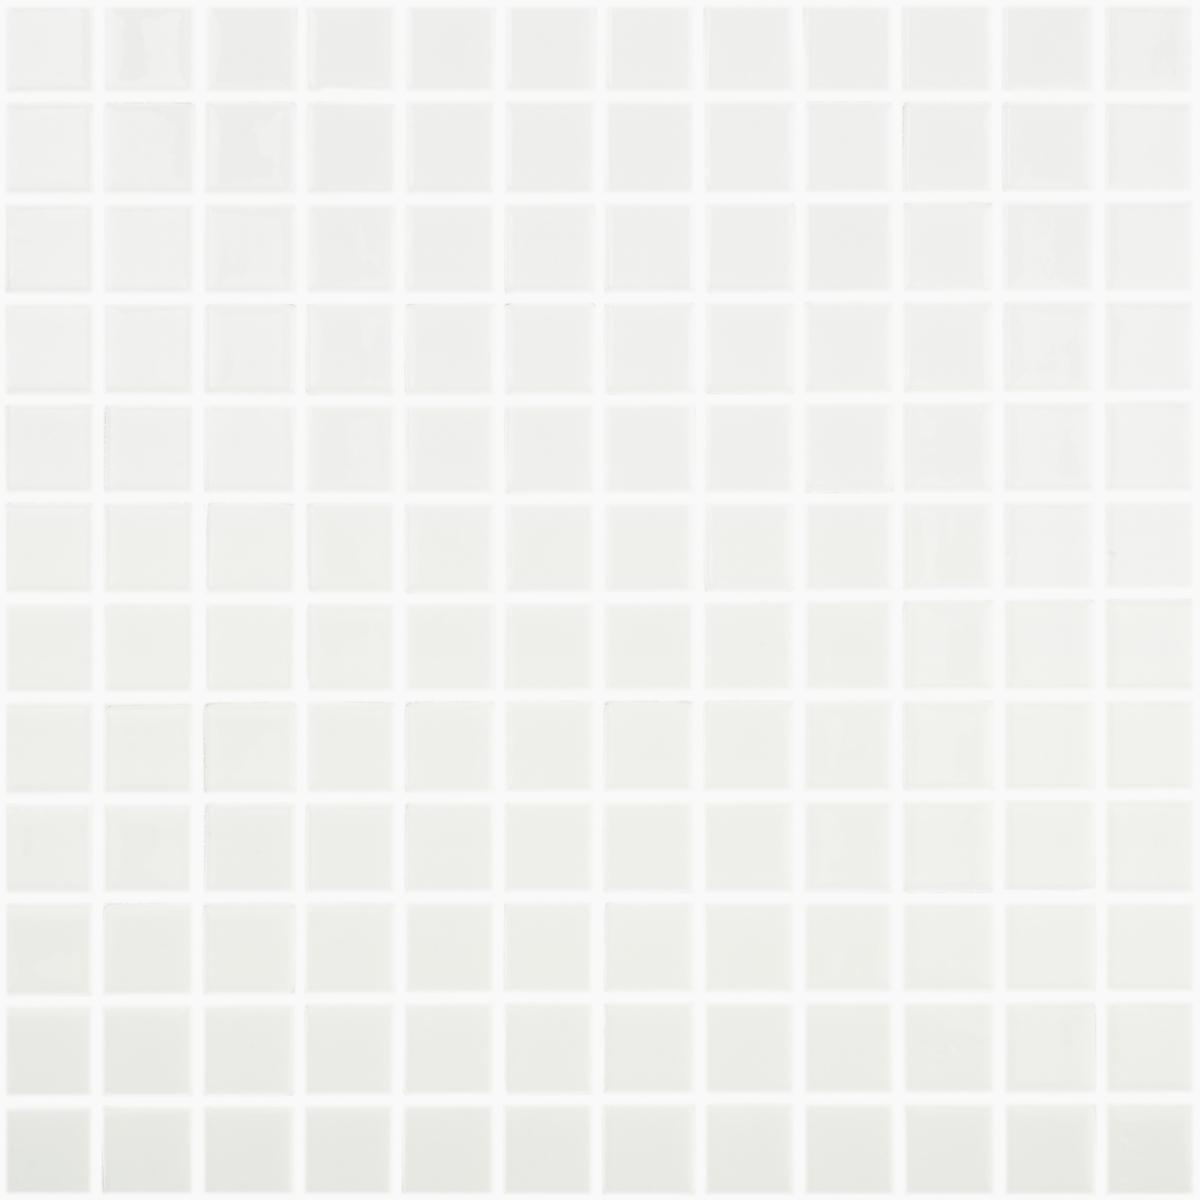 Gresite Blanco Liso (m2) - Platos de ducha de obra - Marca Vidrepur